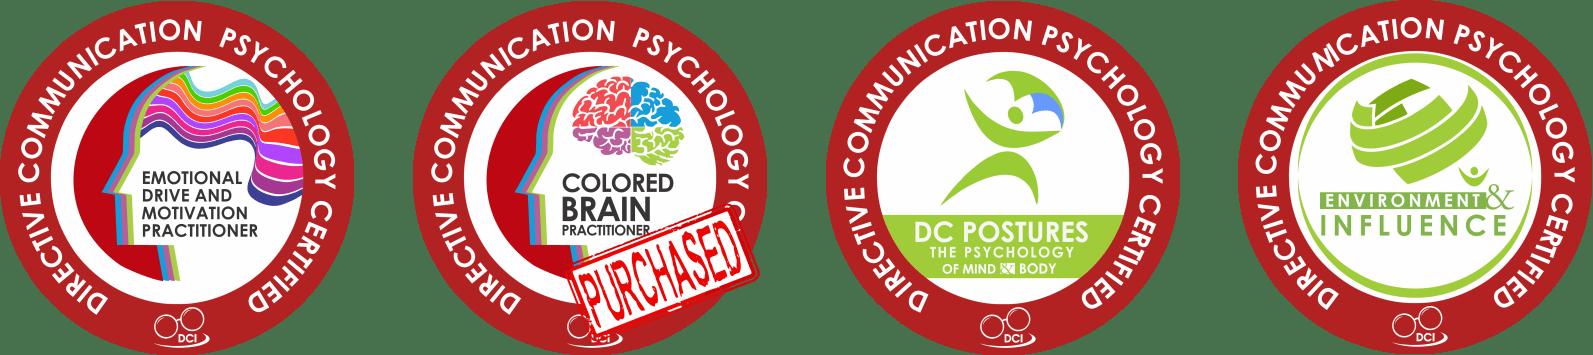 certification-logo-1